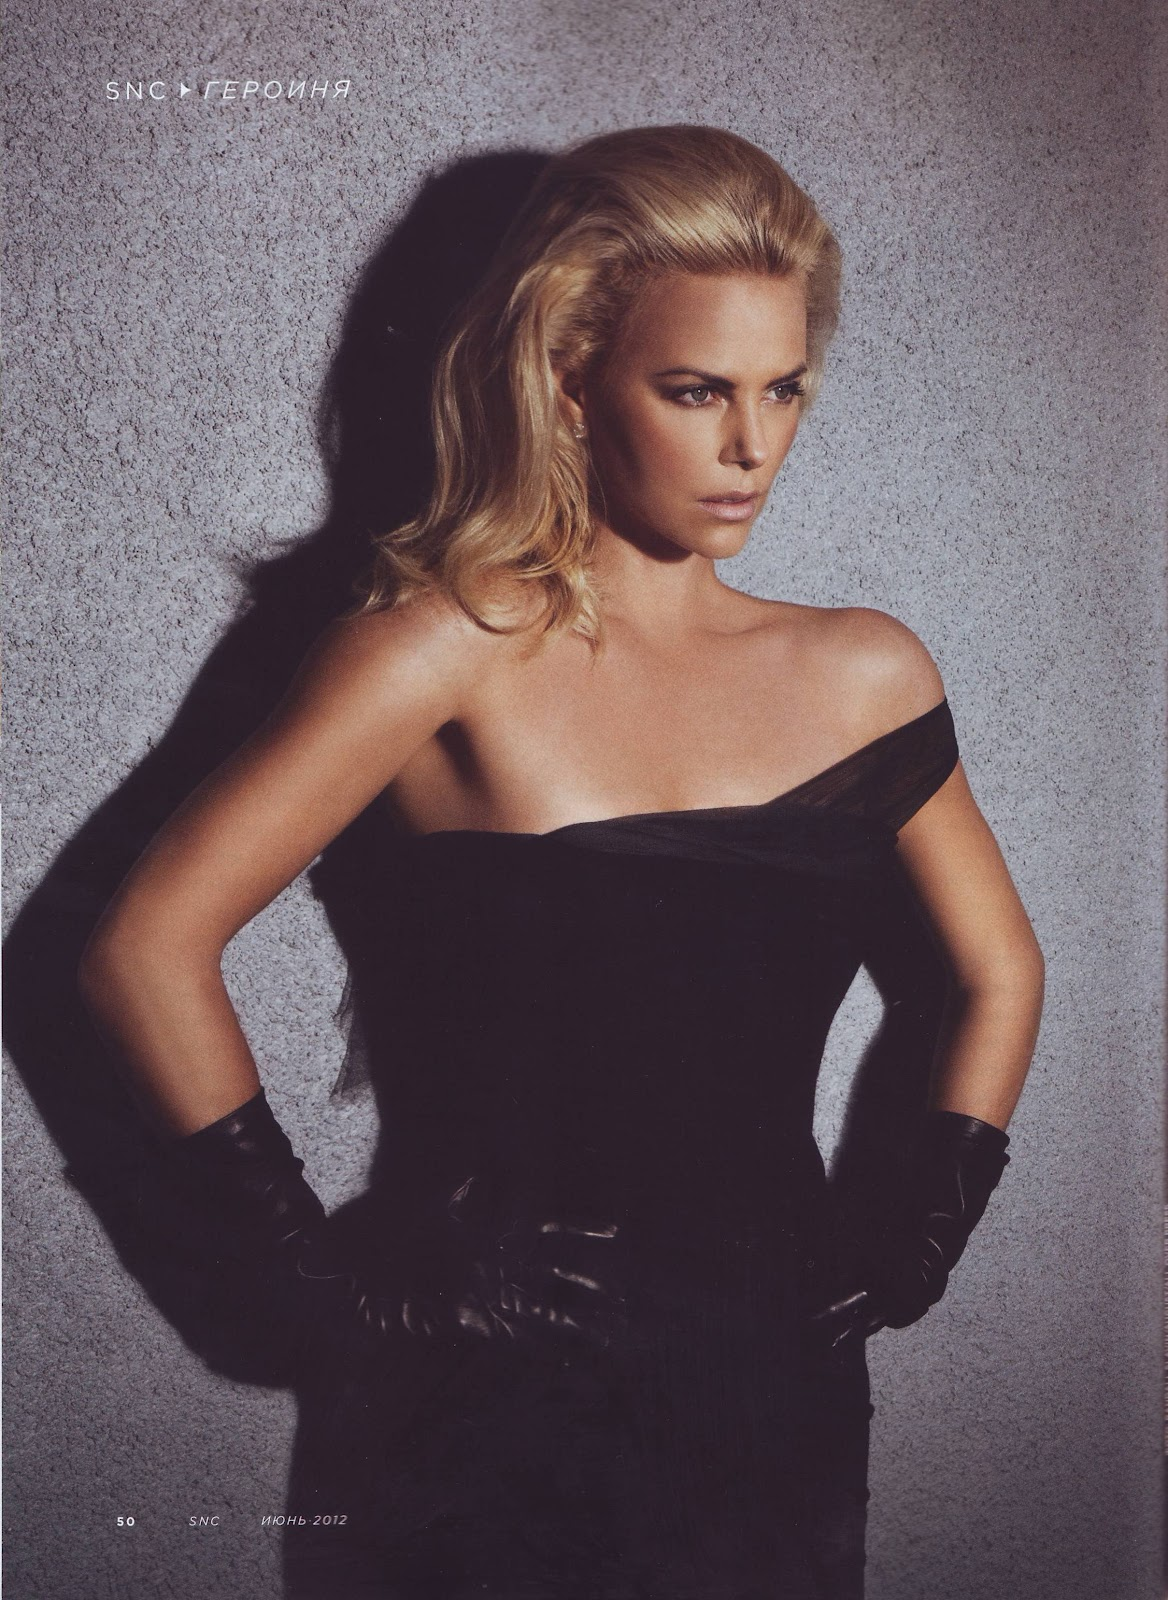 http://3.bp.blogspot.com/-FcNmbK0_Jrw/T9kQWL9OK9I/AAAAAAAAHvY/DXSF_-o1k-Q/s1600/Charlize+Theron+in+SNC+Magazine+Russia+-+June+2012-01.jpg